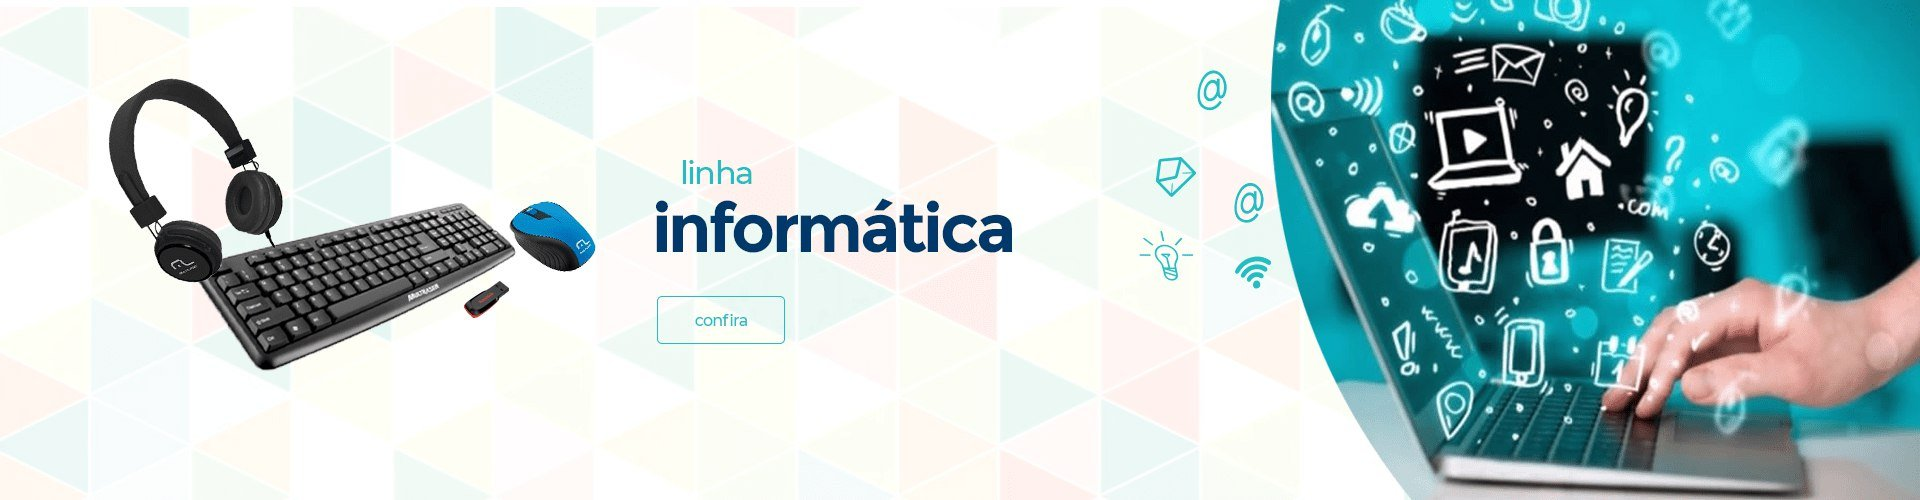 FullBanner_INFORMATICA